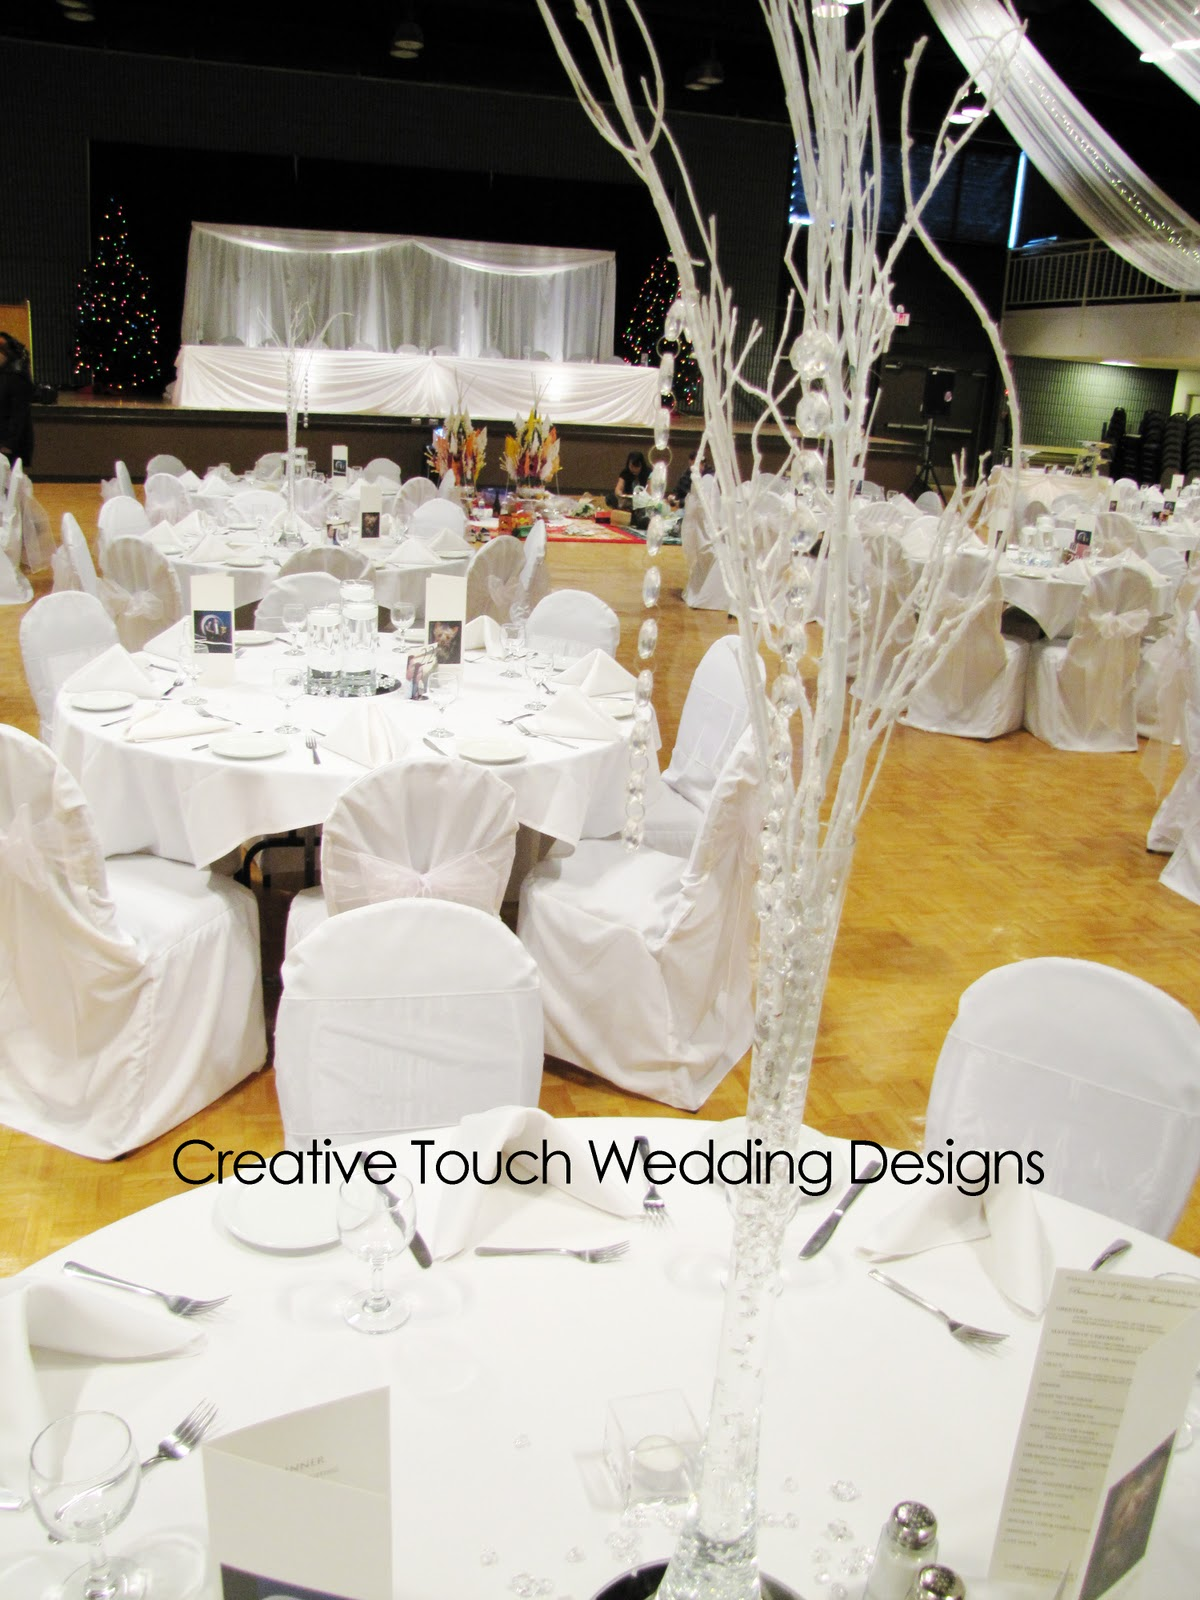 Creative Touch Wedding Designs: Turvey Centre - Dec 2010 - Winter ...